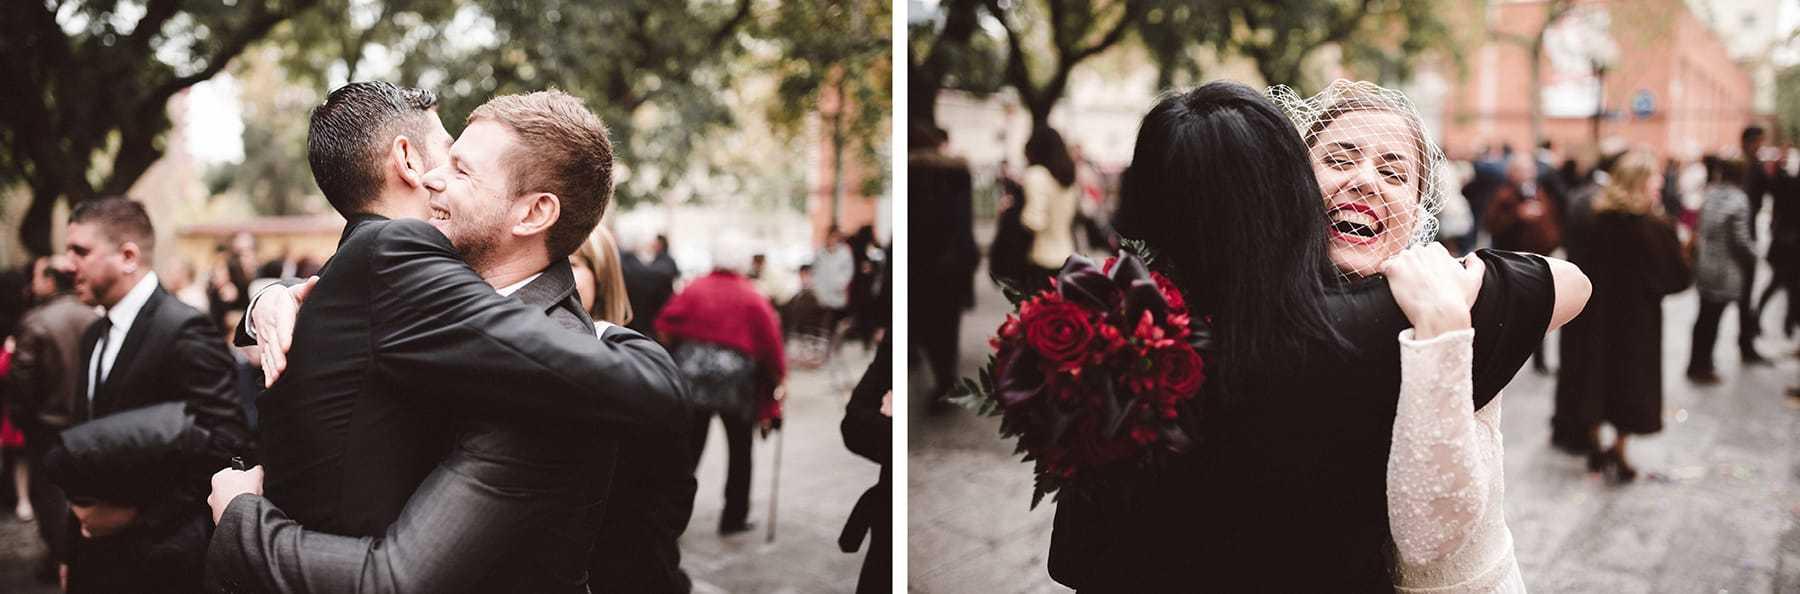 vestido_de_novia_otaduy_hilario_sanchez_fotografo_boda_barcelona_075